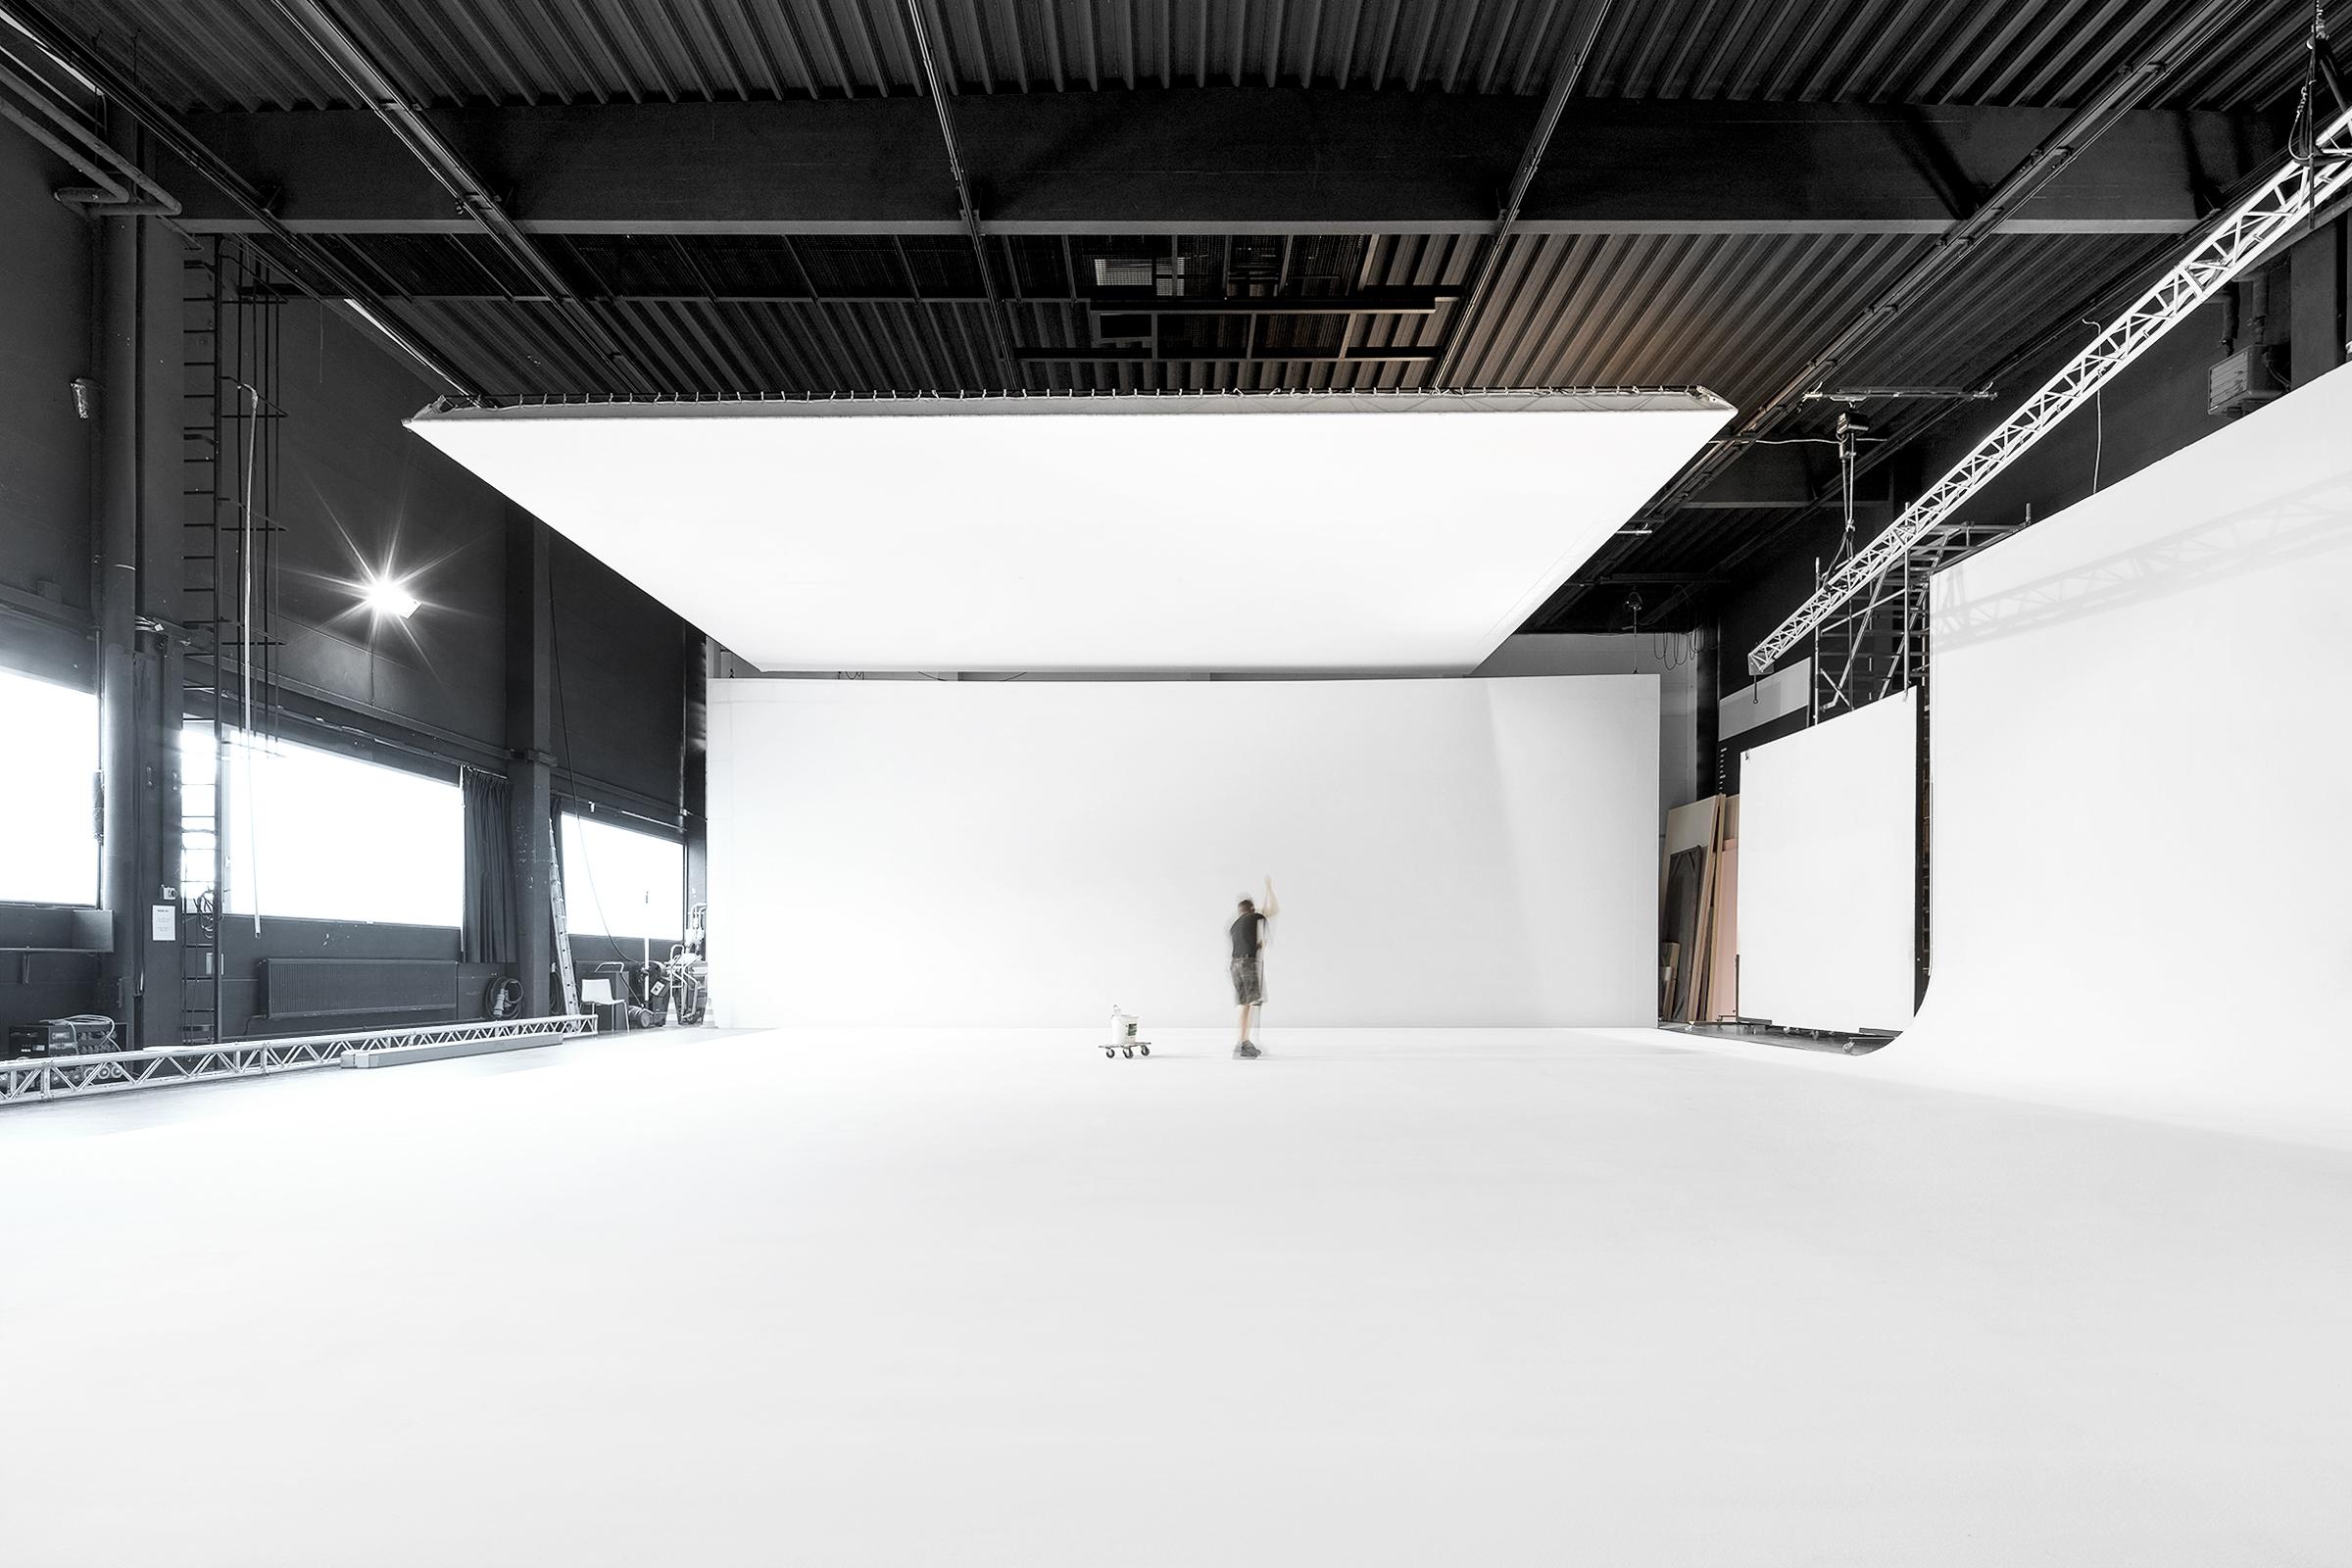 snap_studios-Studio2_1_bearb.jpg